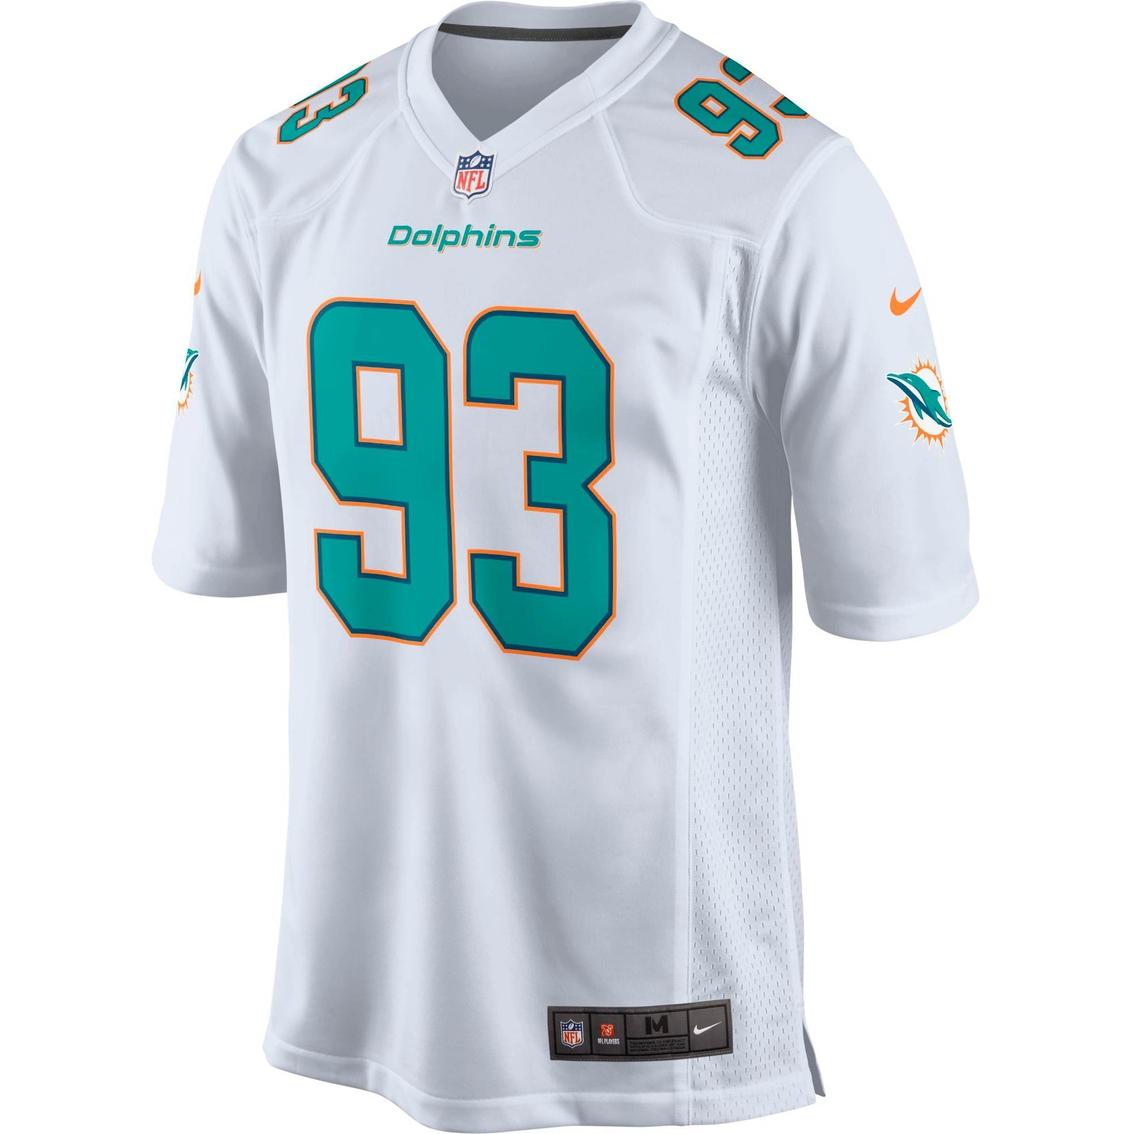 95ab1454618af Nike Nfl Miami Dolphins Men's Ndamukong Suh White Game Jersey ...